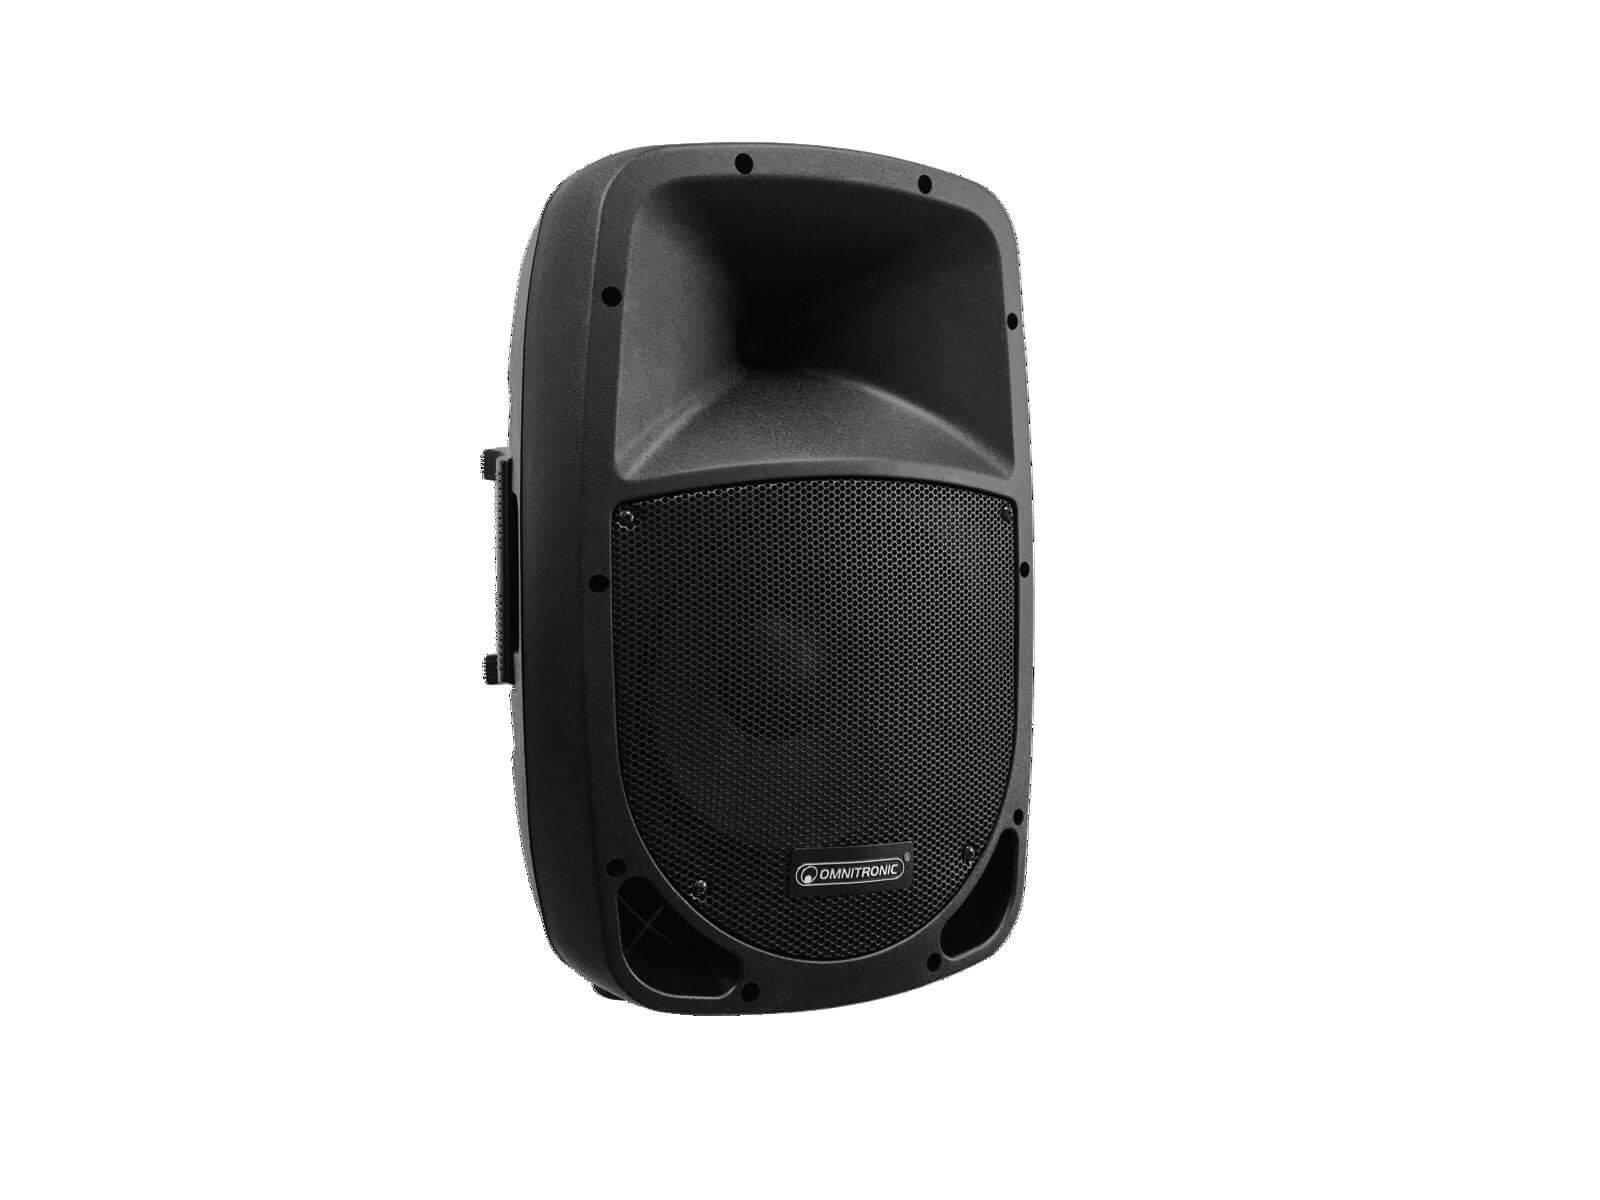 OMNITRONIC VFM-210AP 2-Way Speaker, active